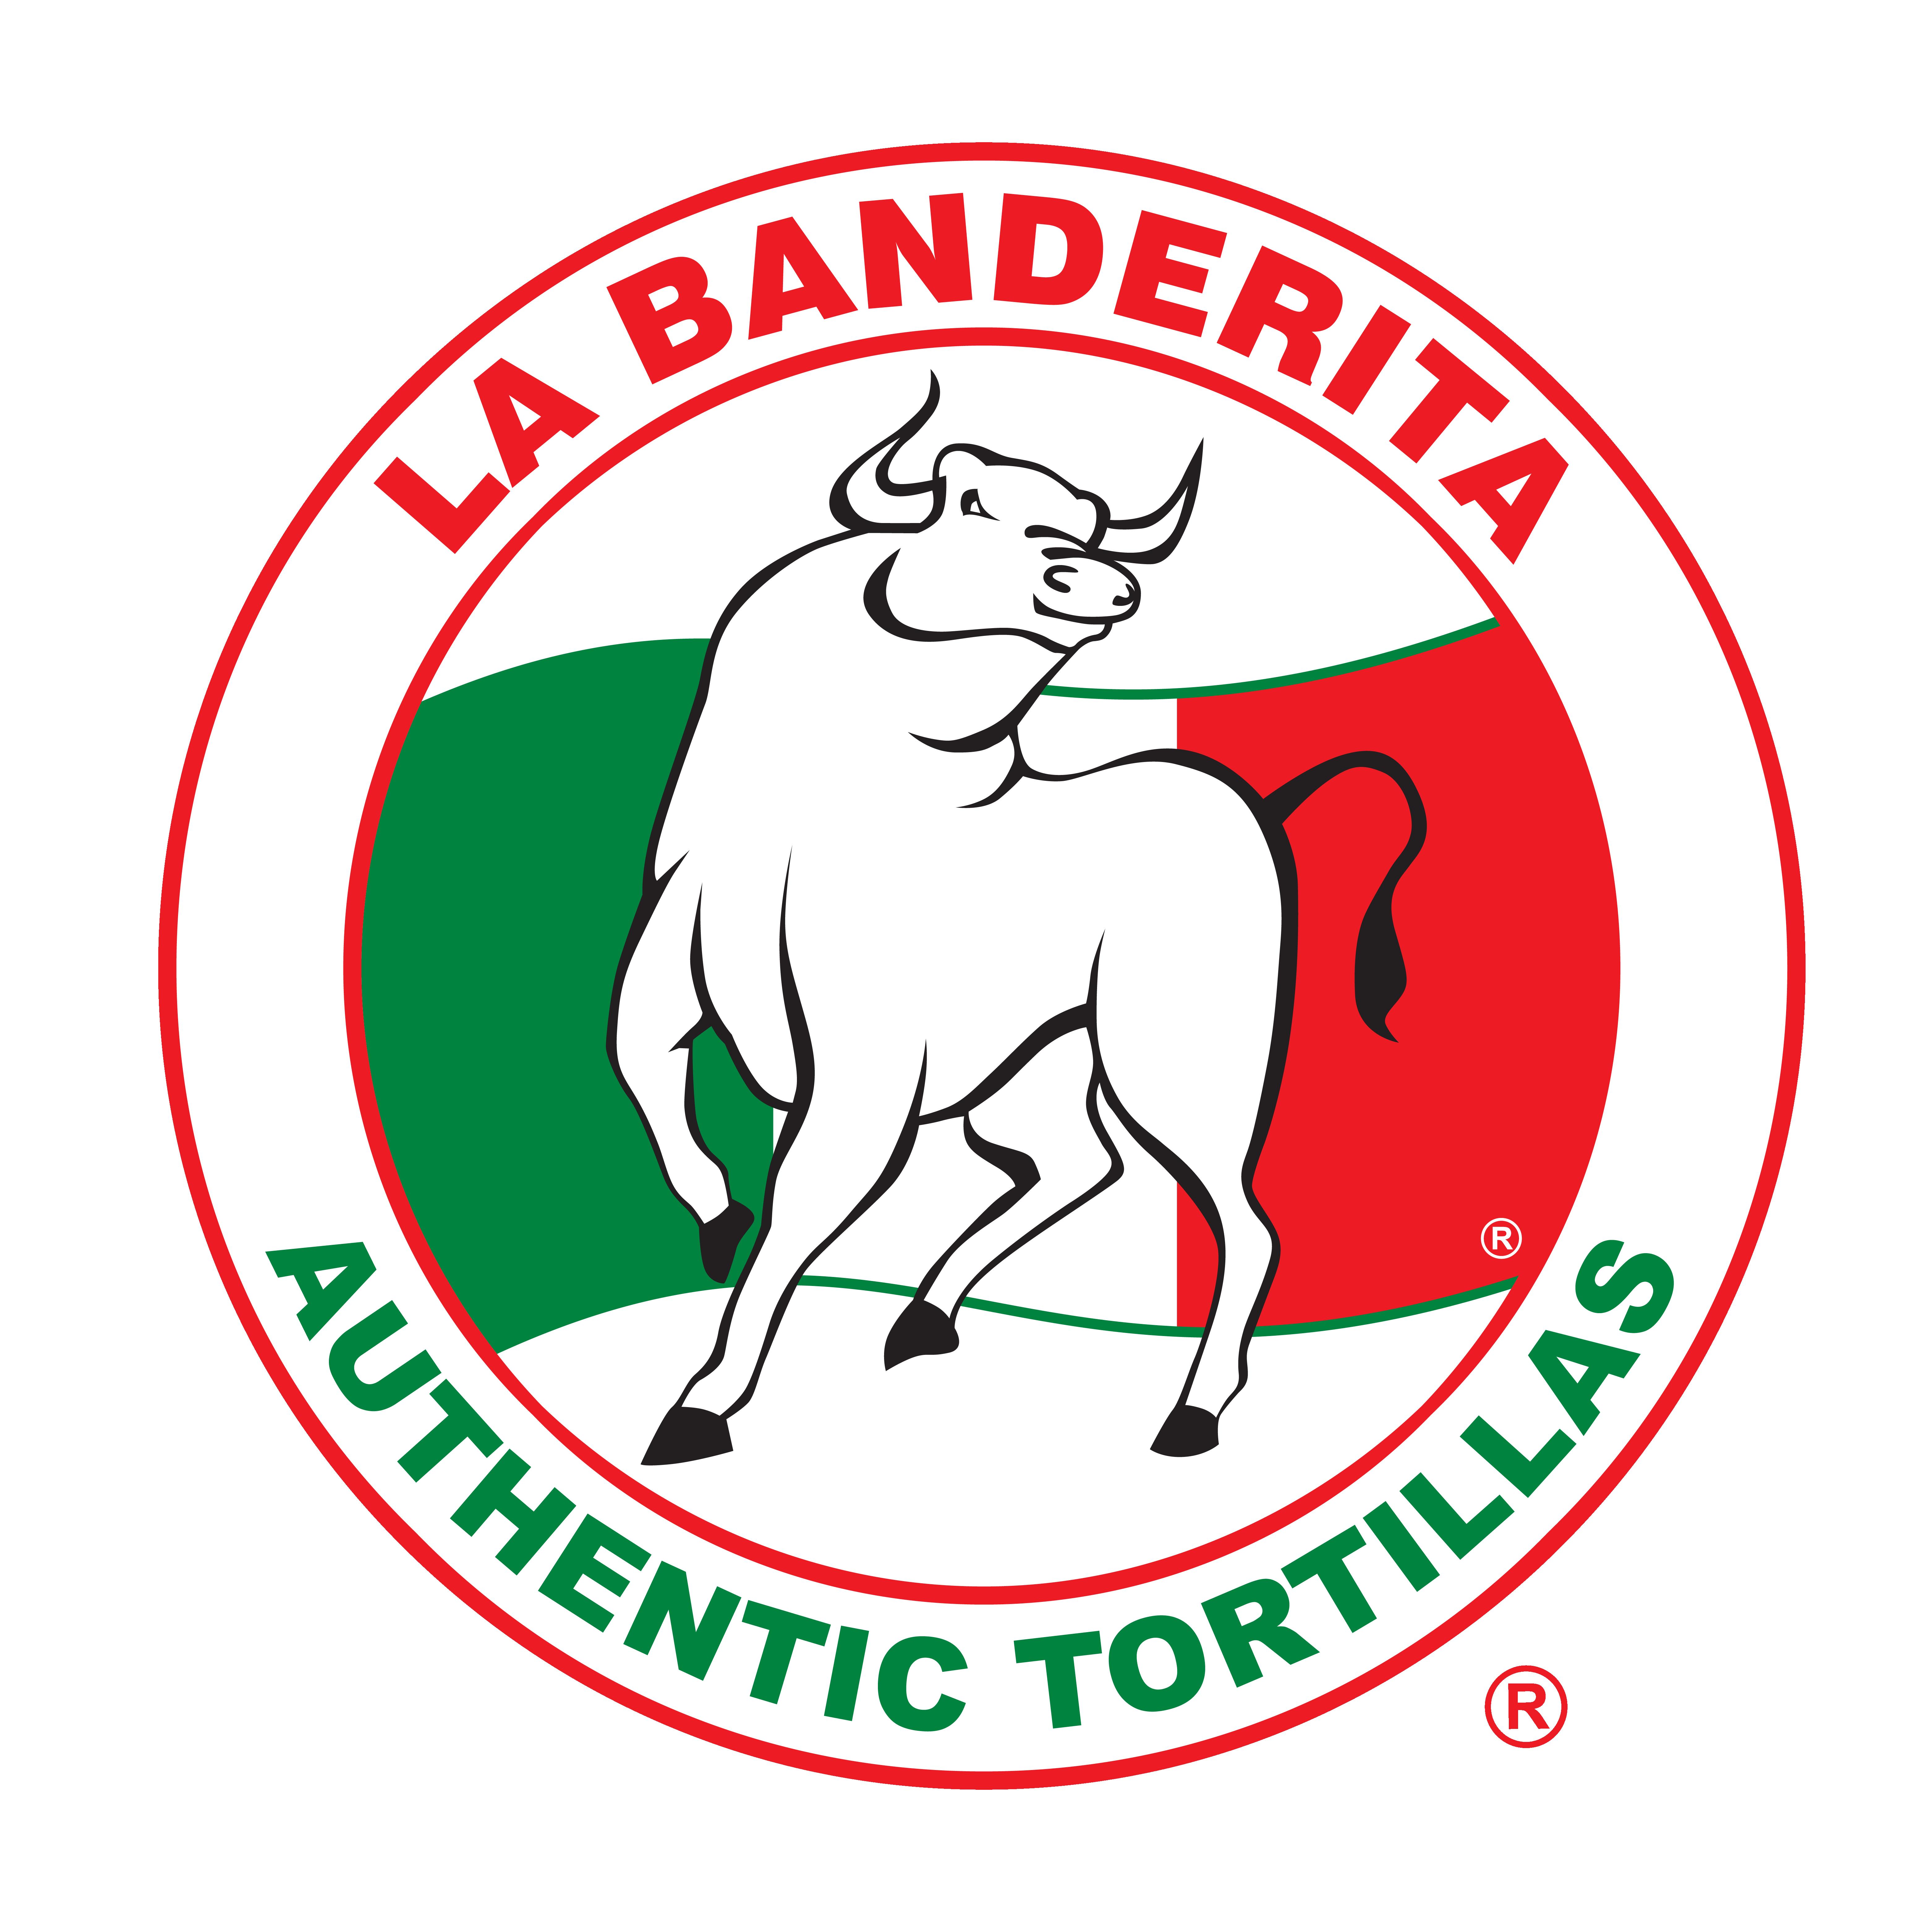 01139 - La Banderita Low Sodium - Front